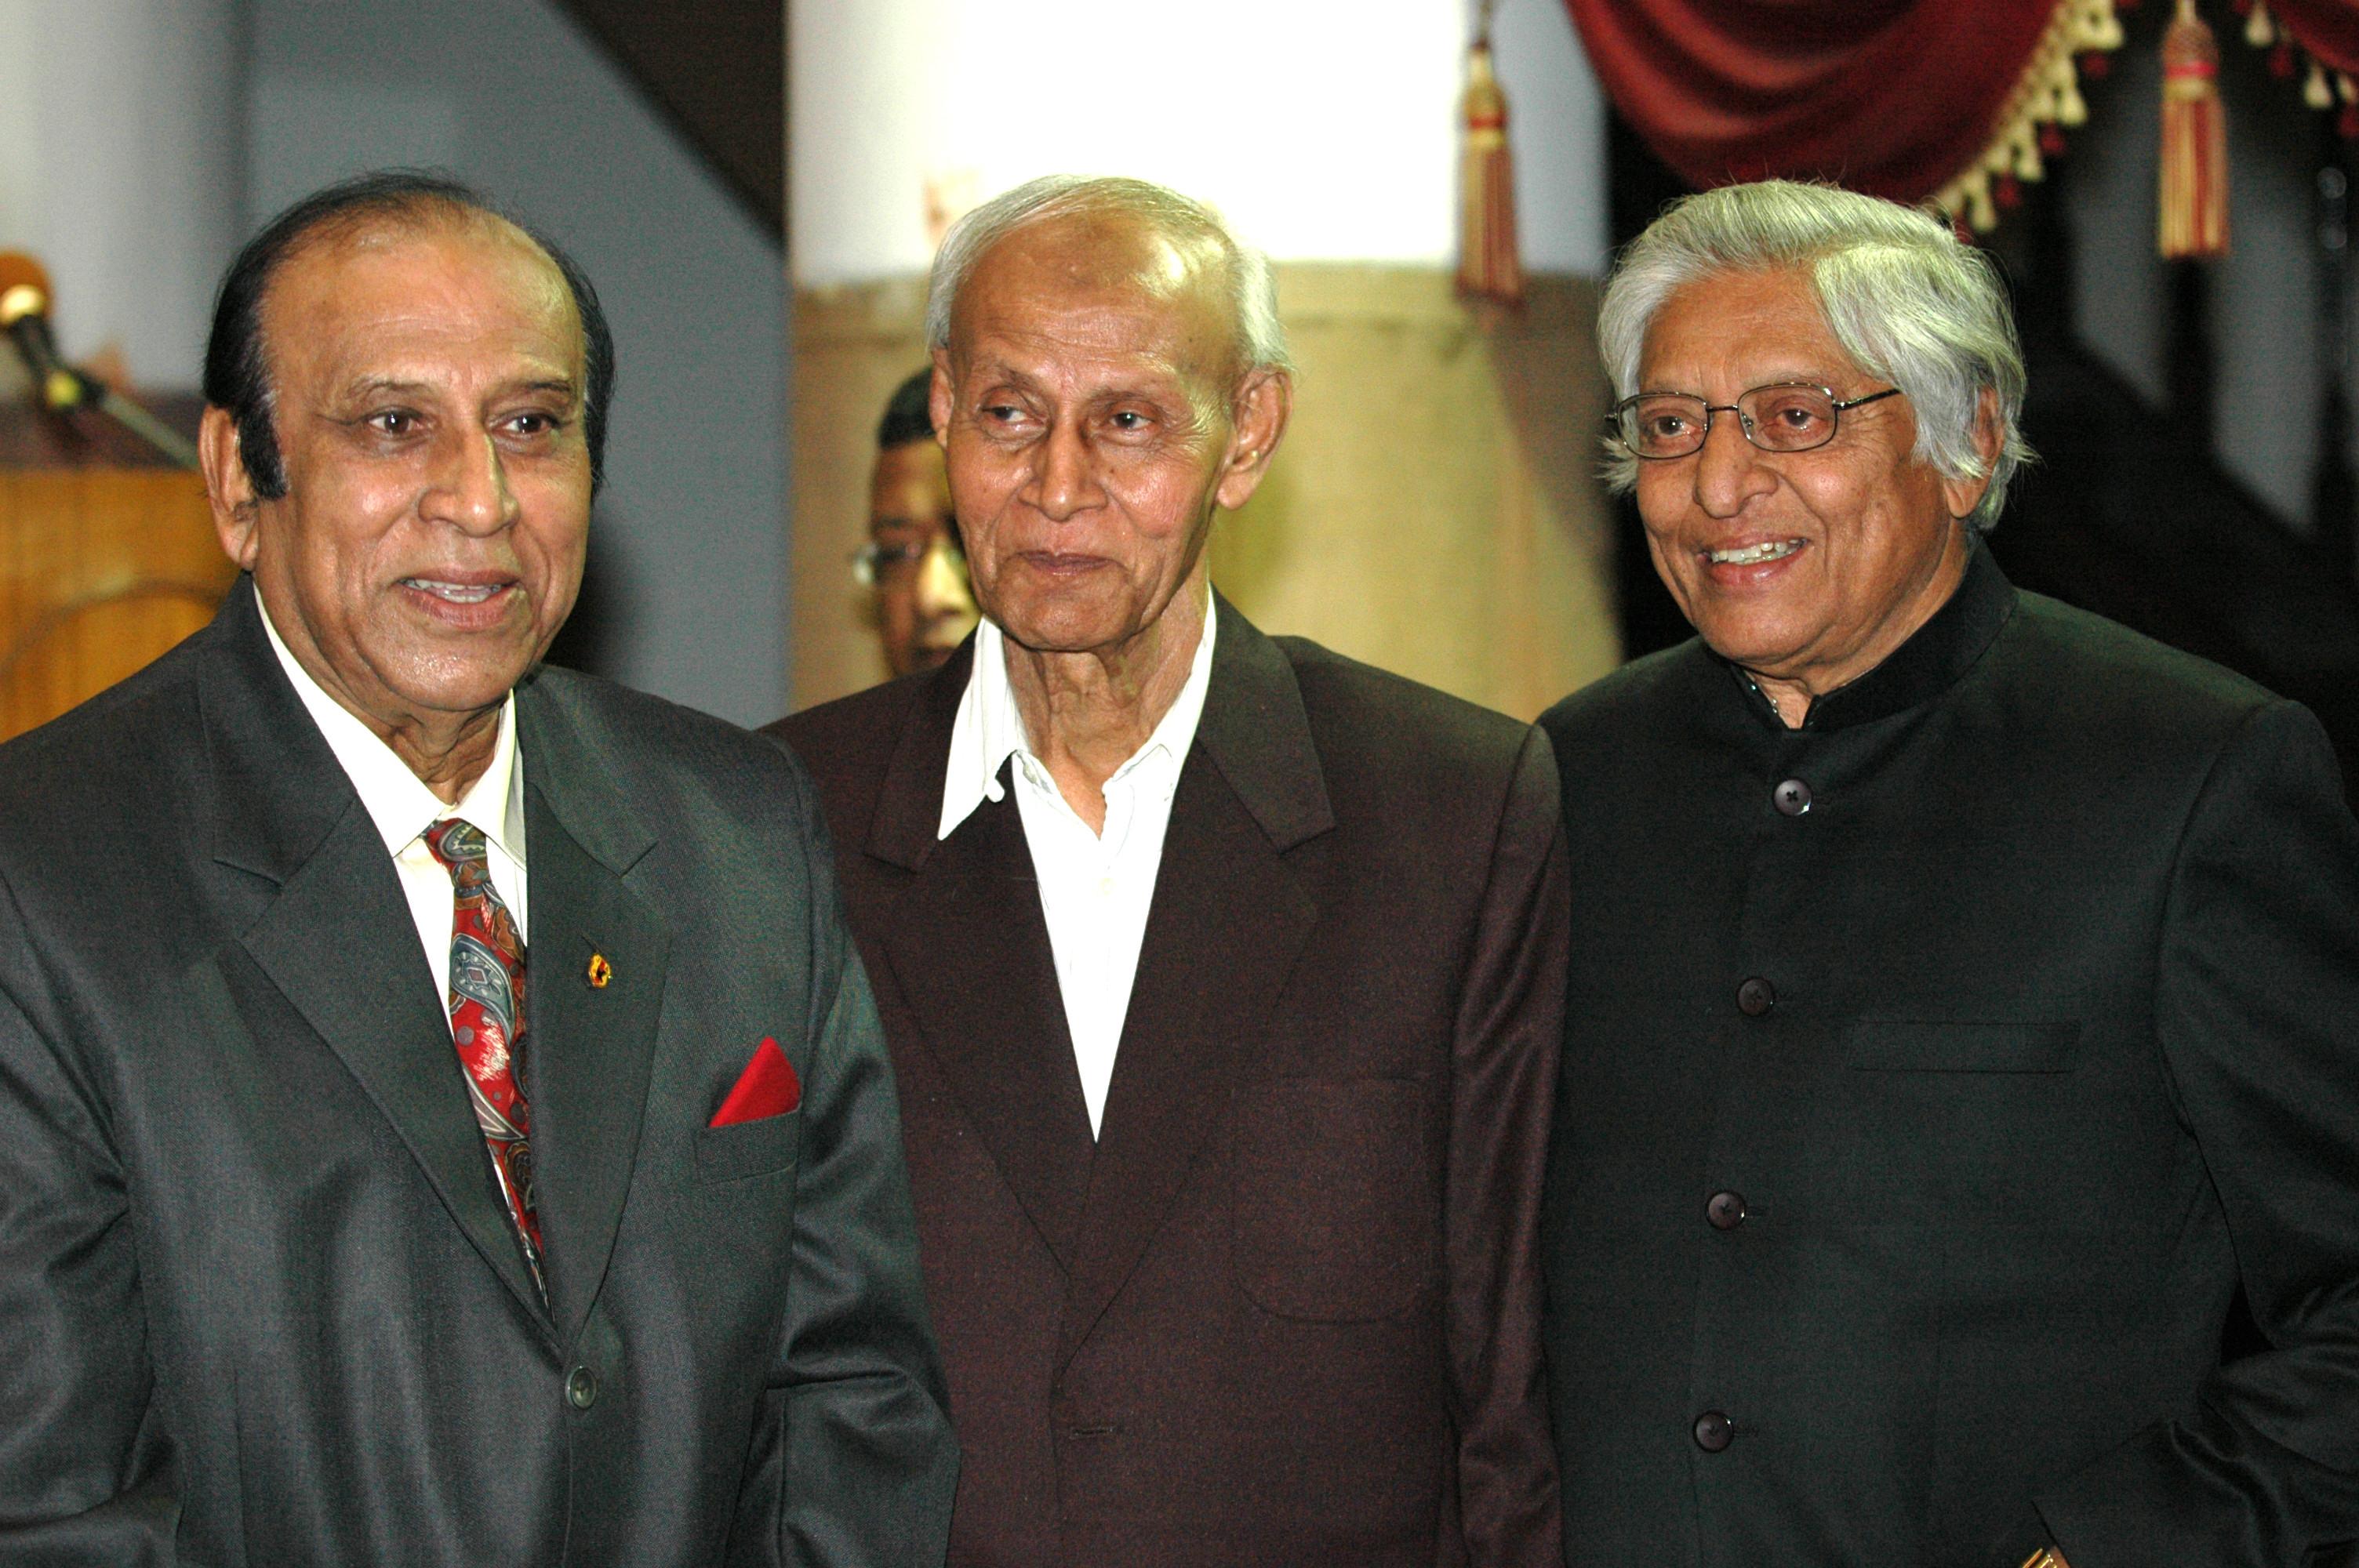 Legends among legends; PK with Chuni Goswami and Sailen Manna.